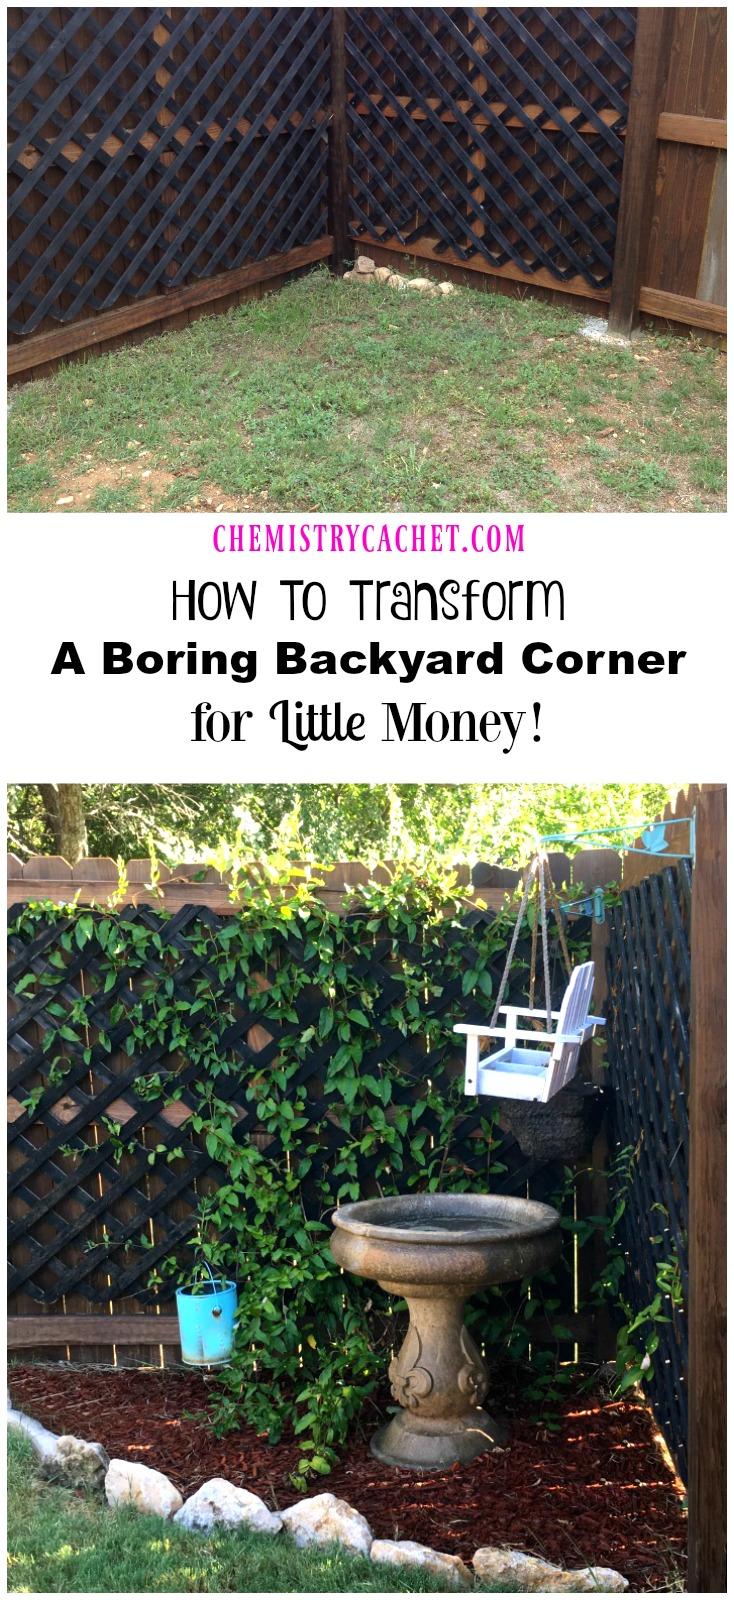 How To Transform A Boring Backyard Corner for Little Money!